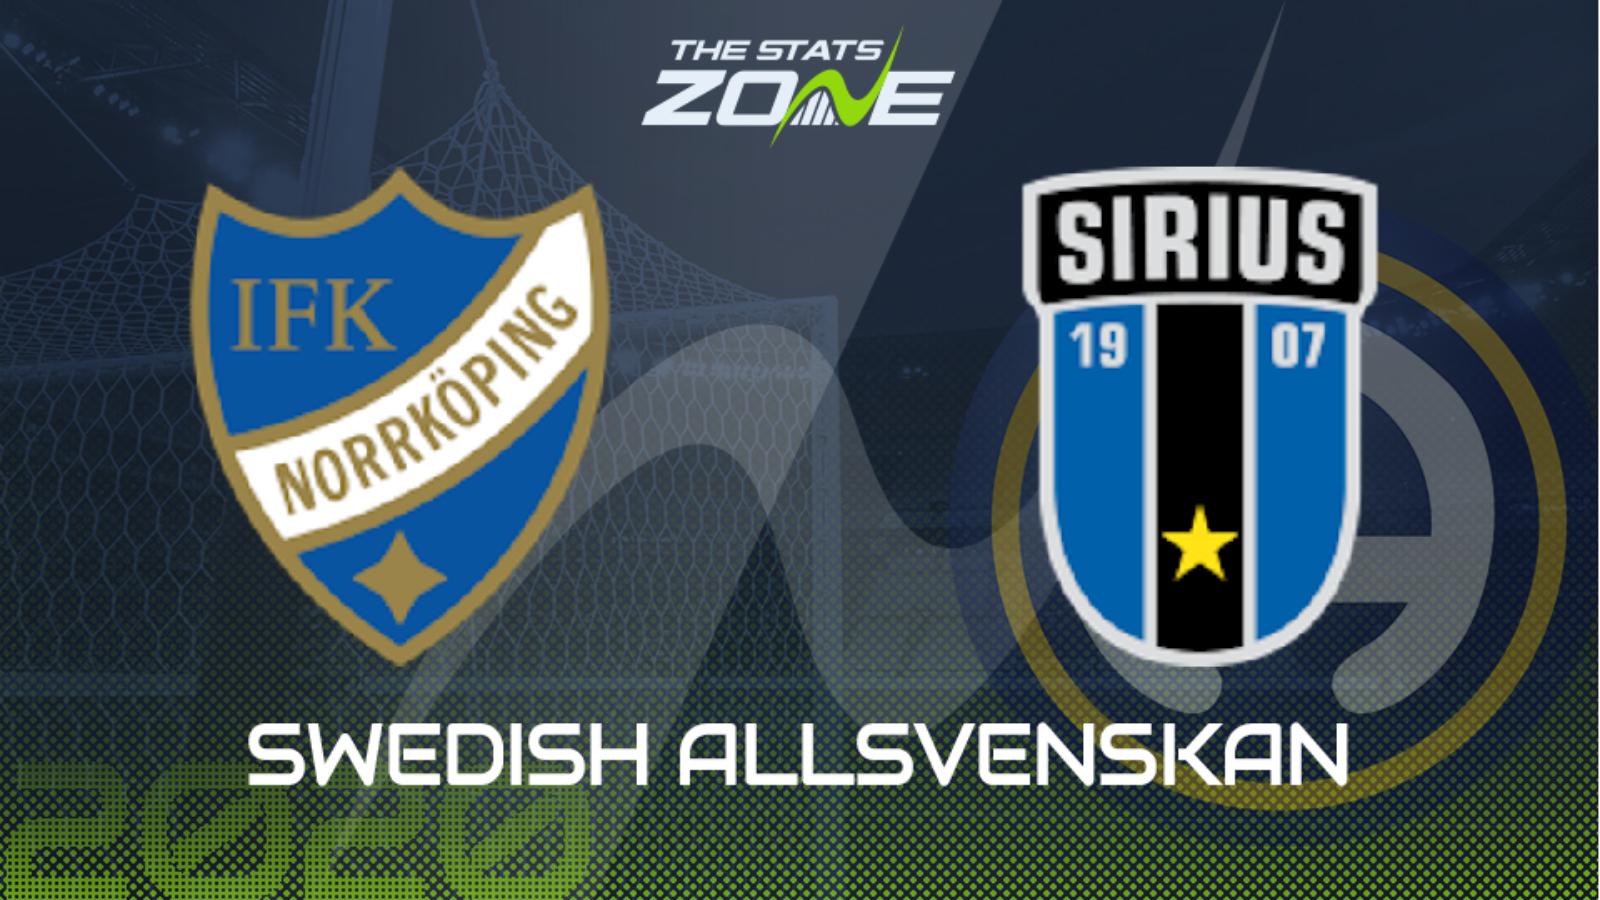 2020 Swedish Allsvenskan Norrkoping Vs Sirius Preview Prediction The Stats Zone